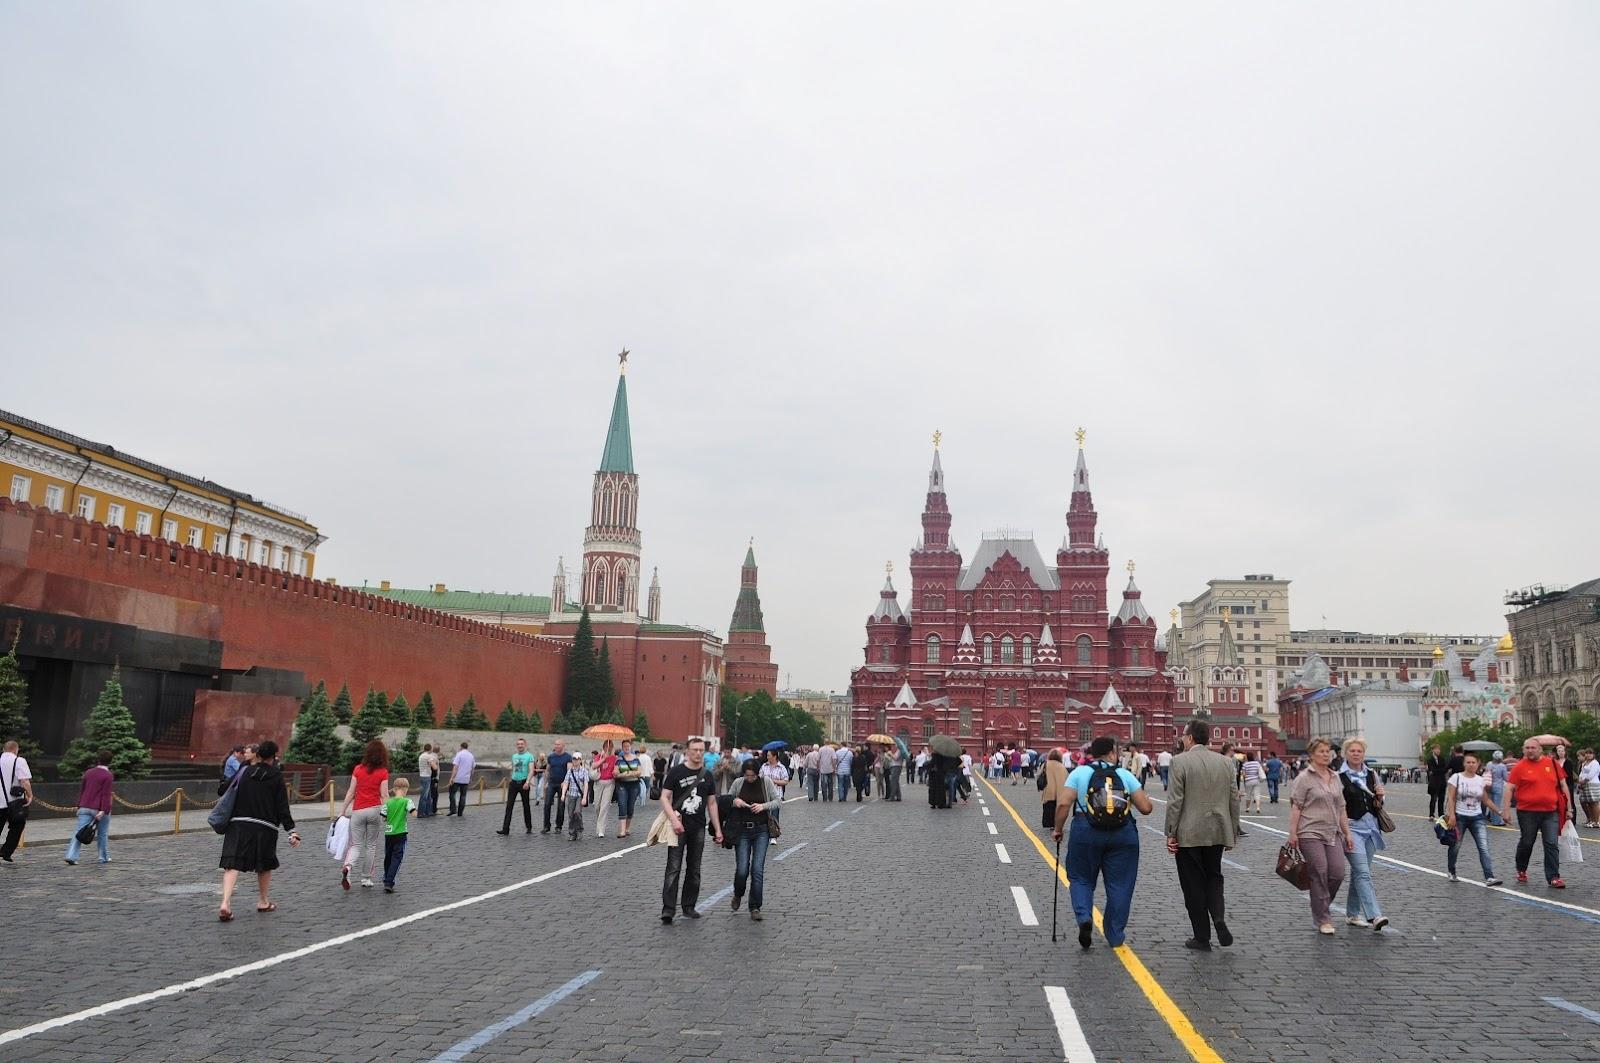 Lapangan Merah di Moskwa Menjadi Tempat Demonstrasi Rakyat Juga Parade Tentara